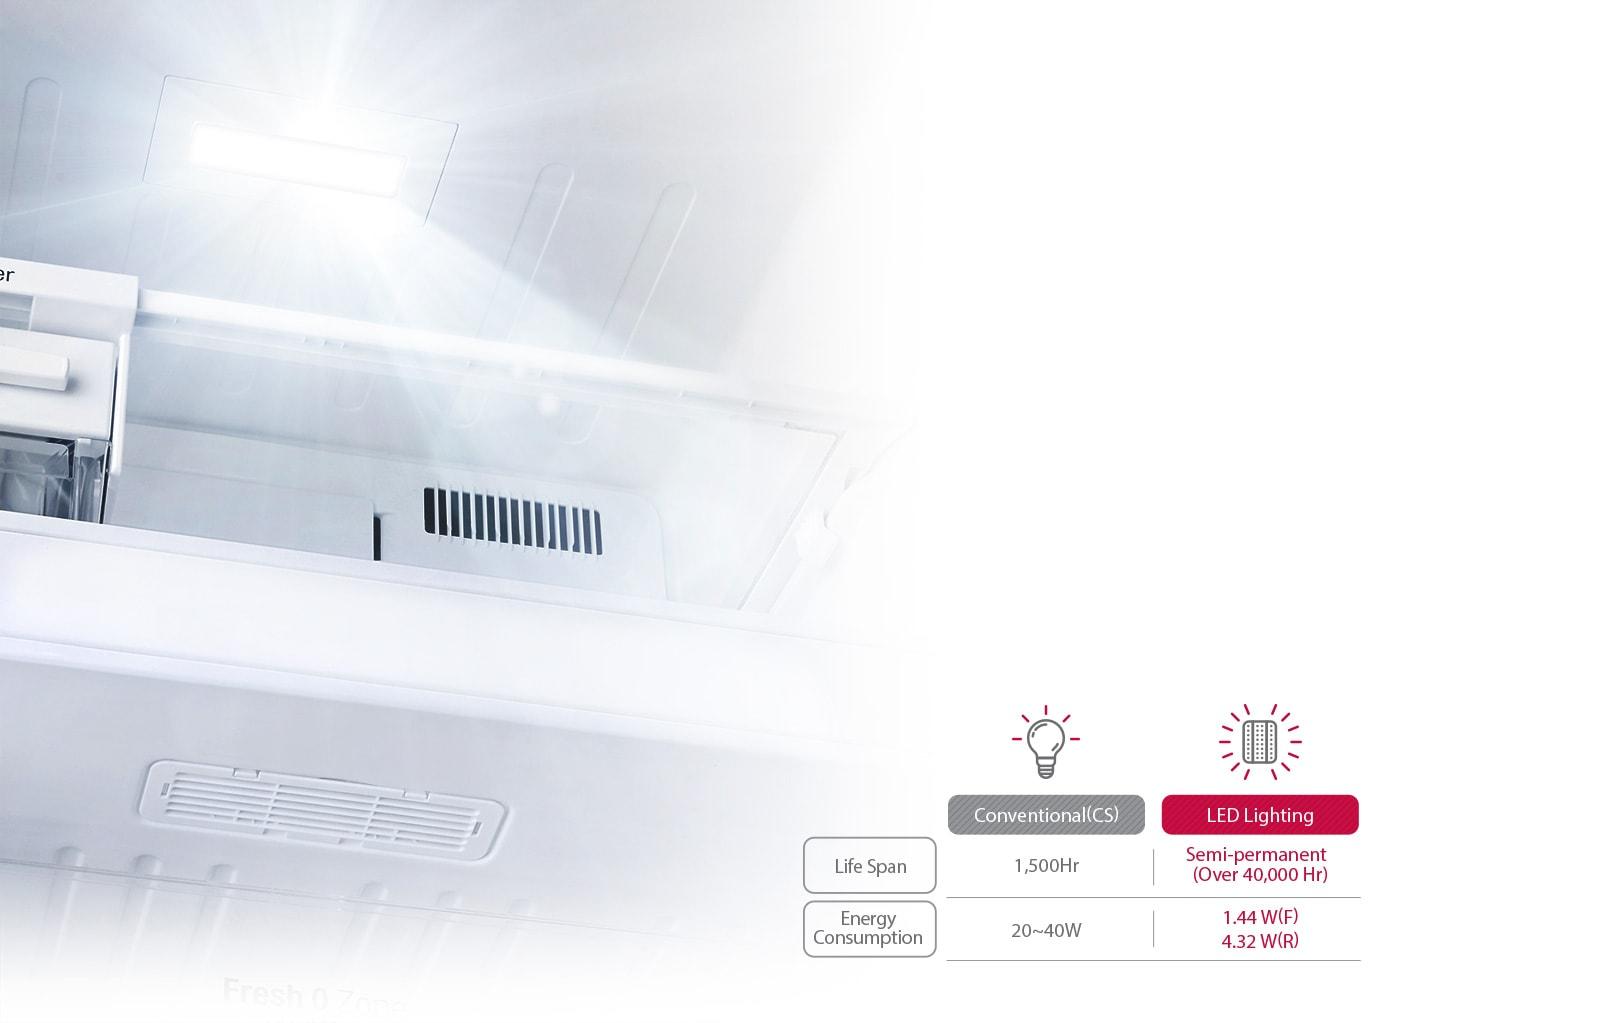 LG GL-T292RBC3 260 Ltr LED Lighting